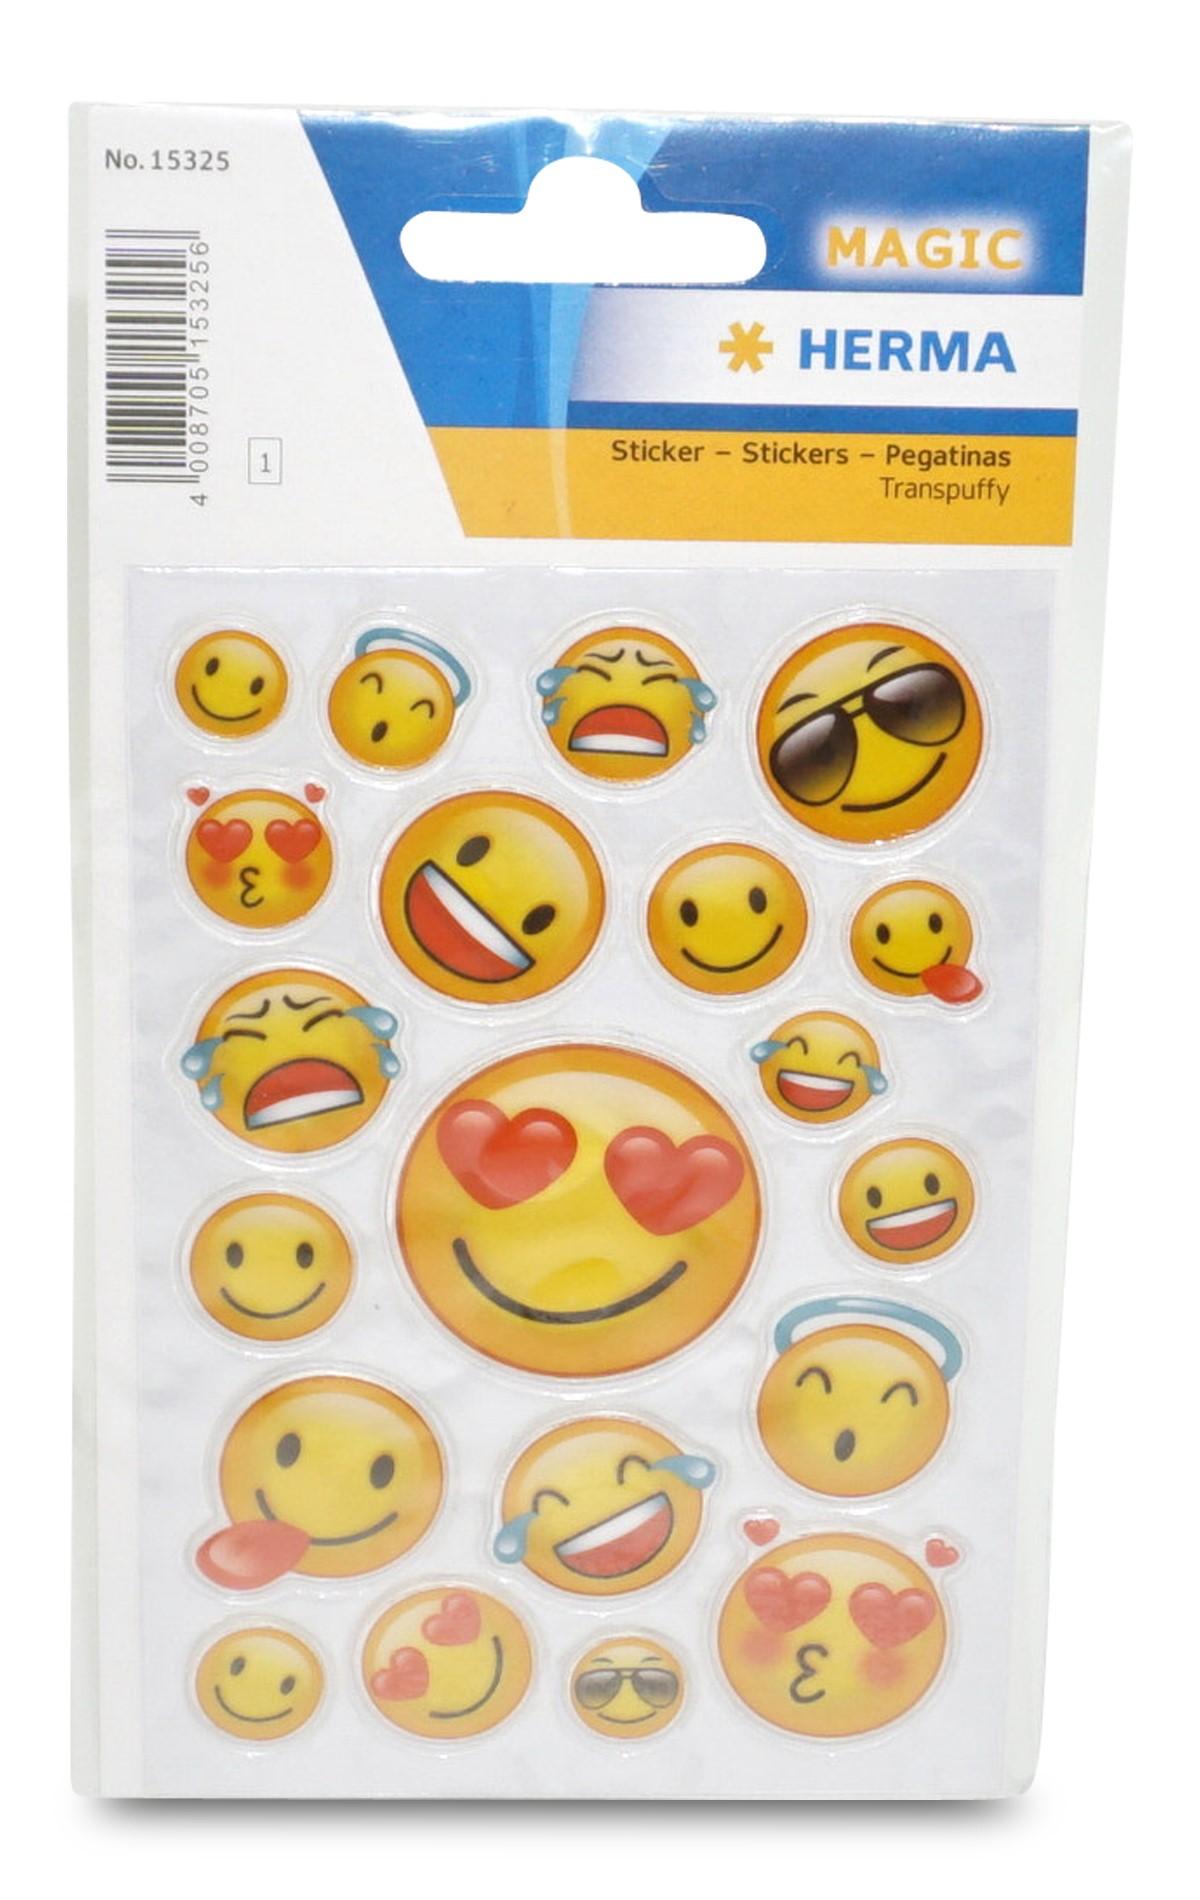 Herma  Magic Sticker